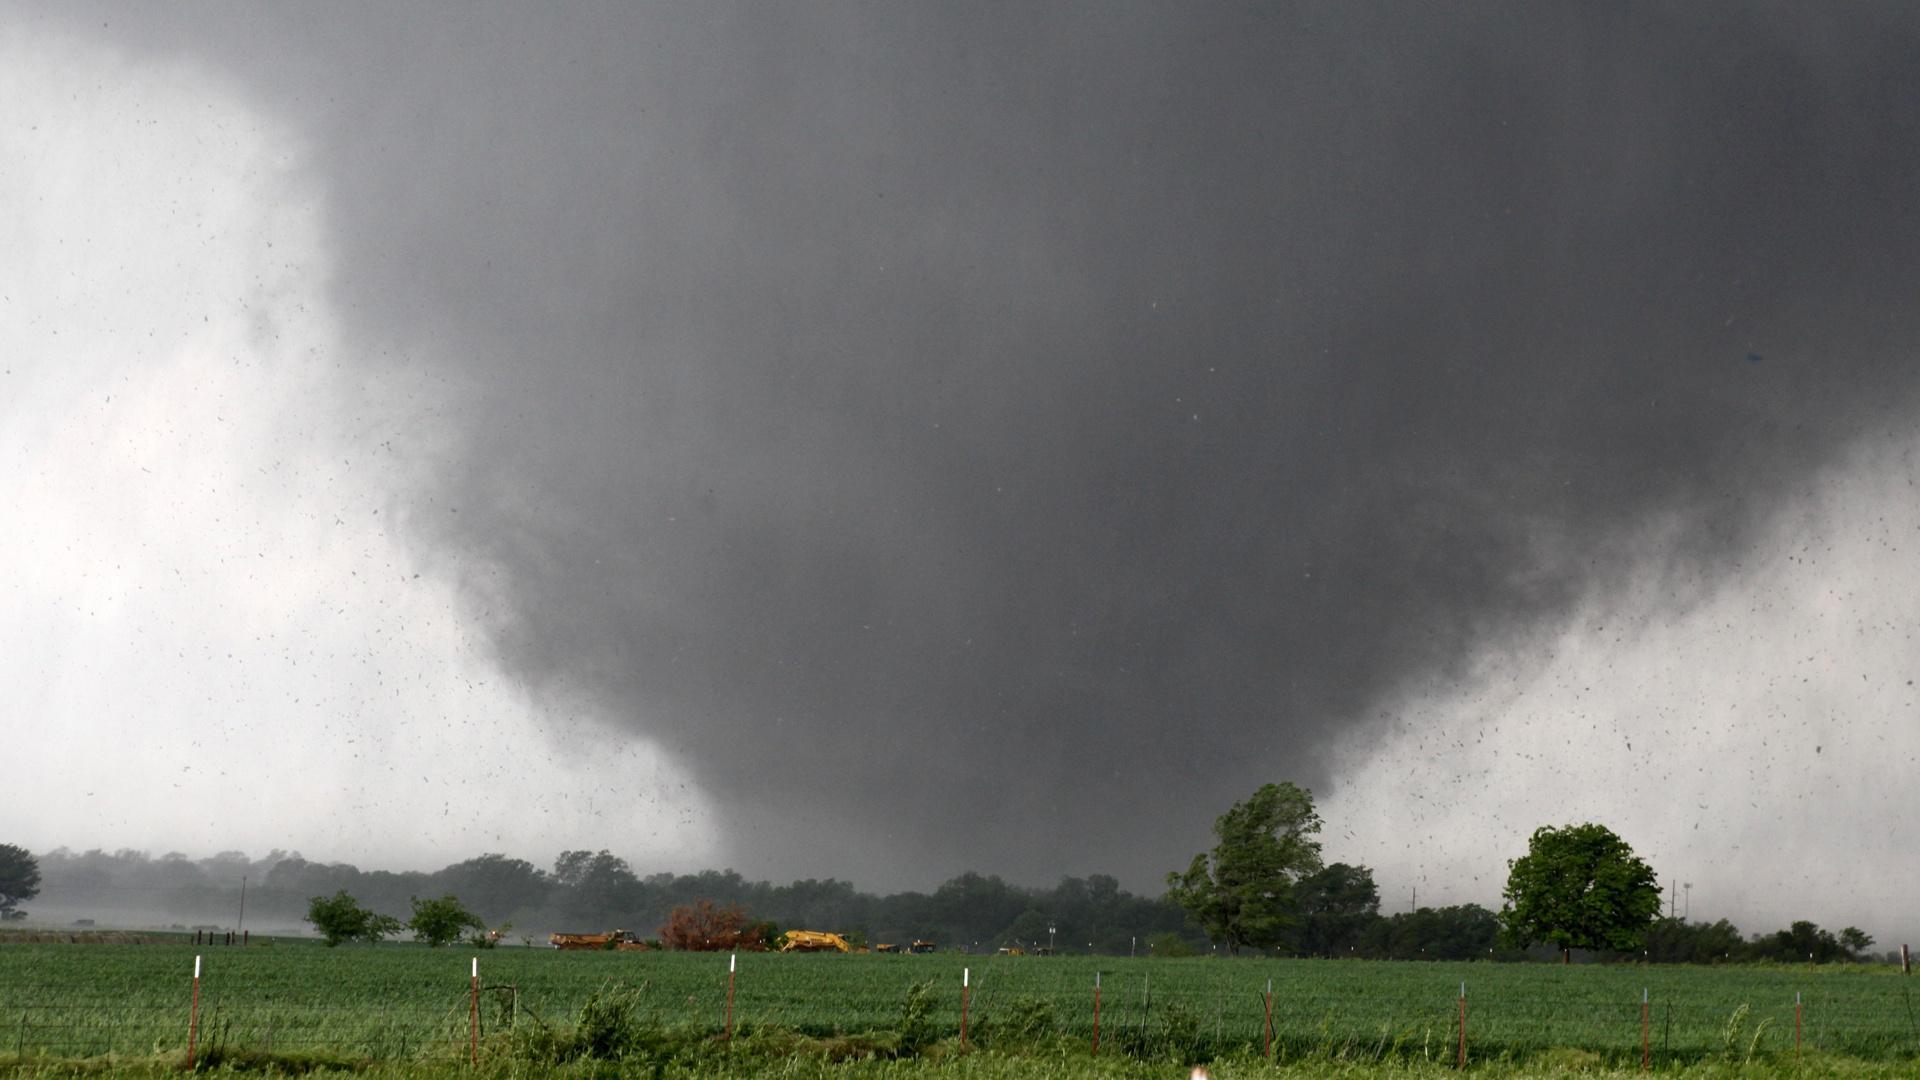 oklahoma u0026 39 s deadliest tornadoes